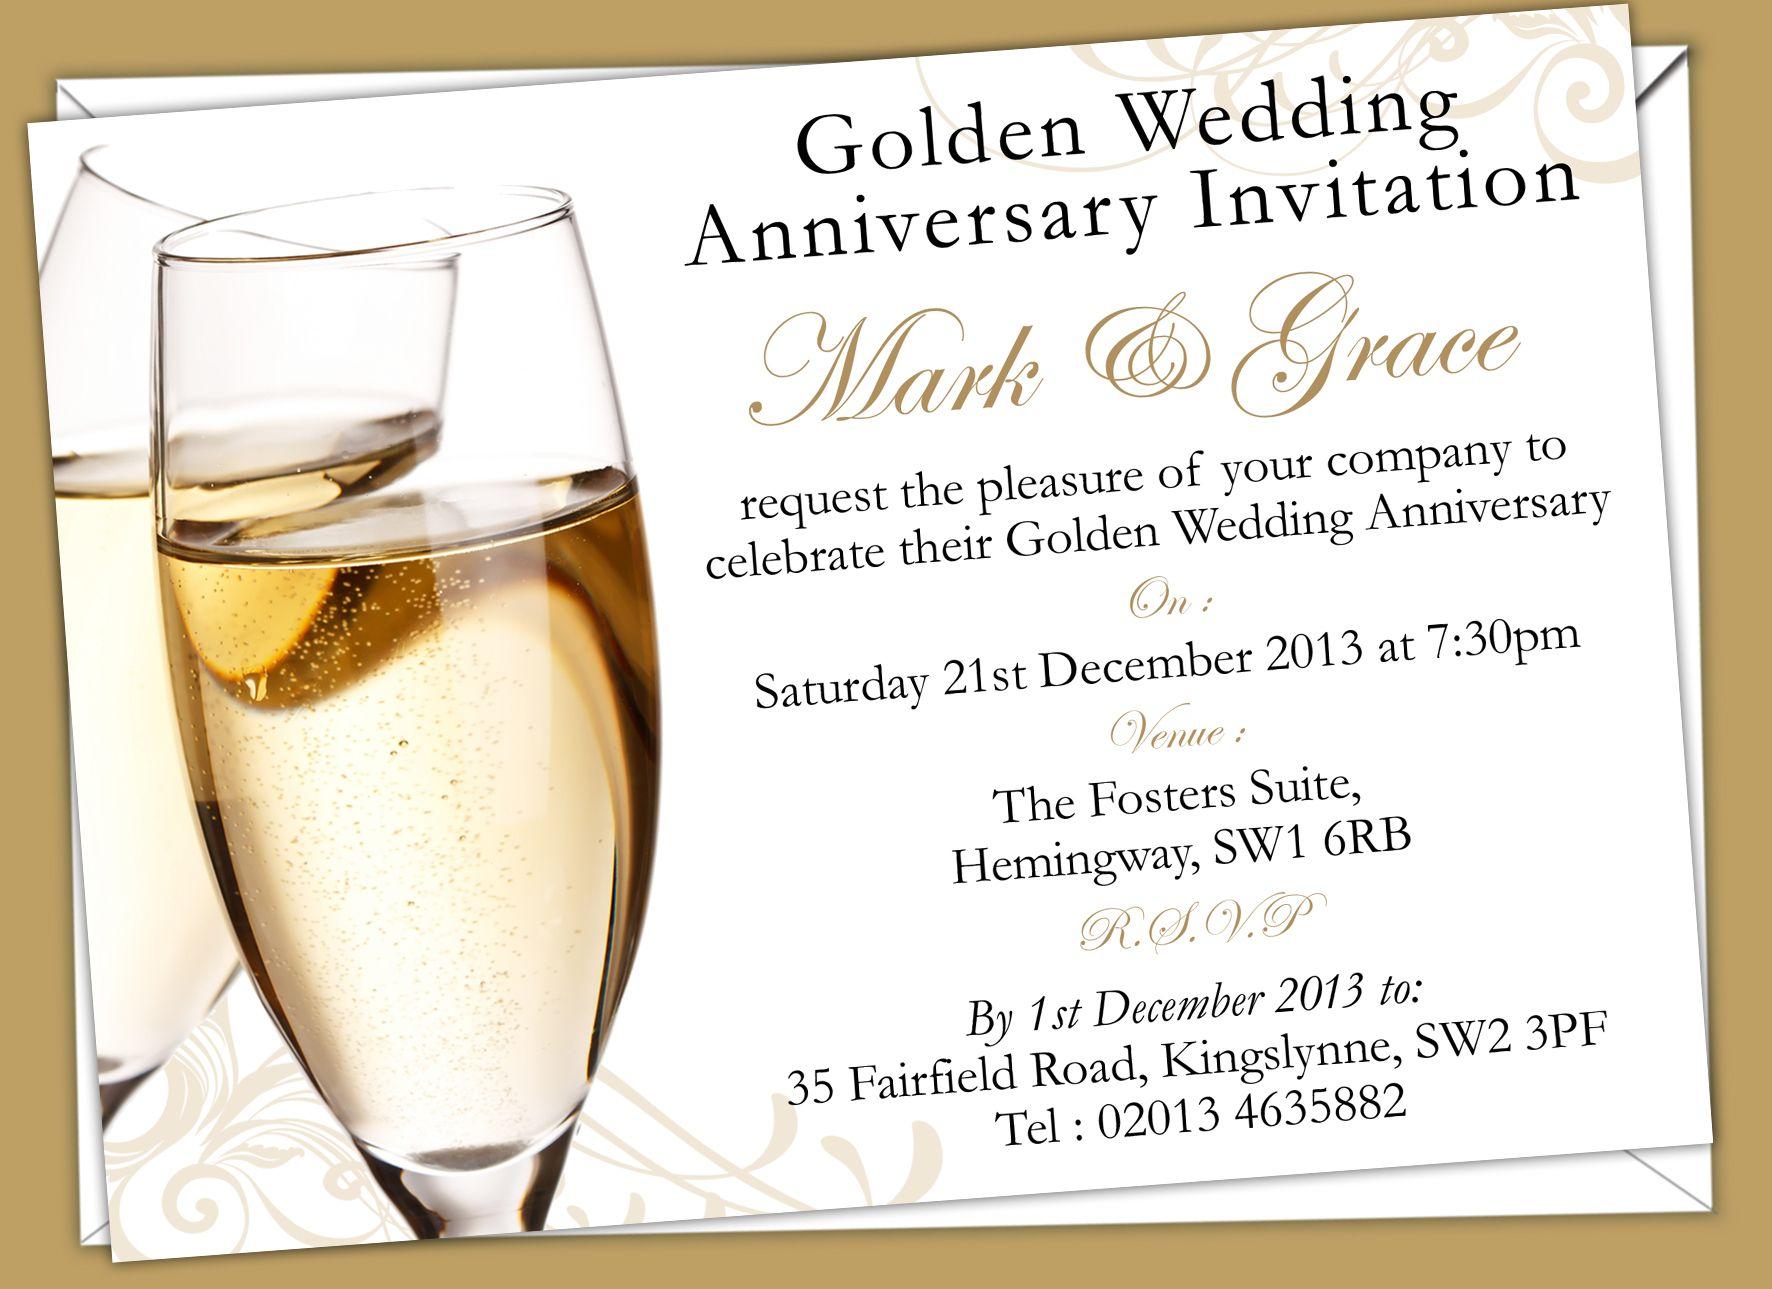 Golden Wedding Anniversary Invitations Prices Start From 6 50 Golden Wedding Anniversary Invitations Wedding Anniversary Invitations Anniversary Invitations